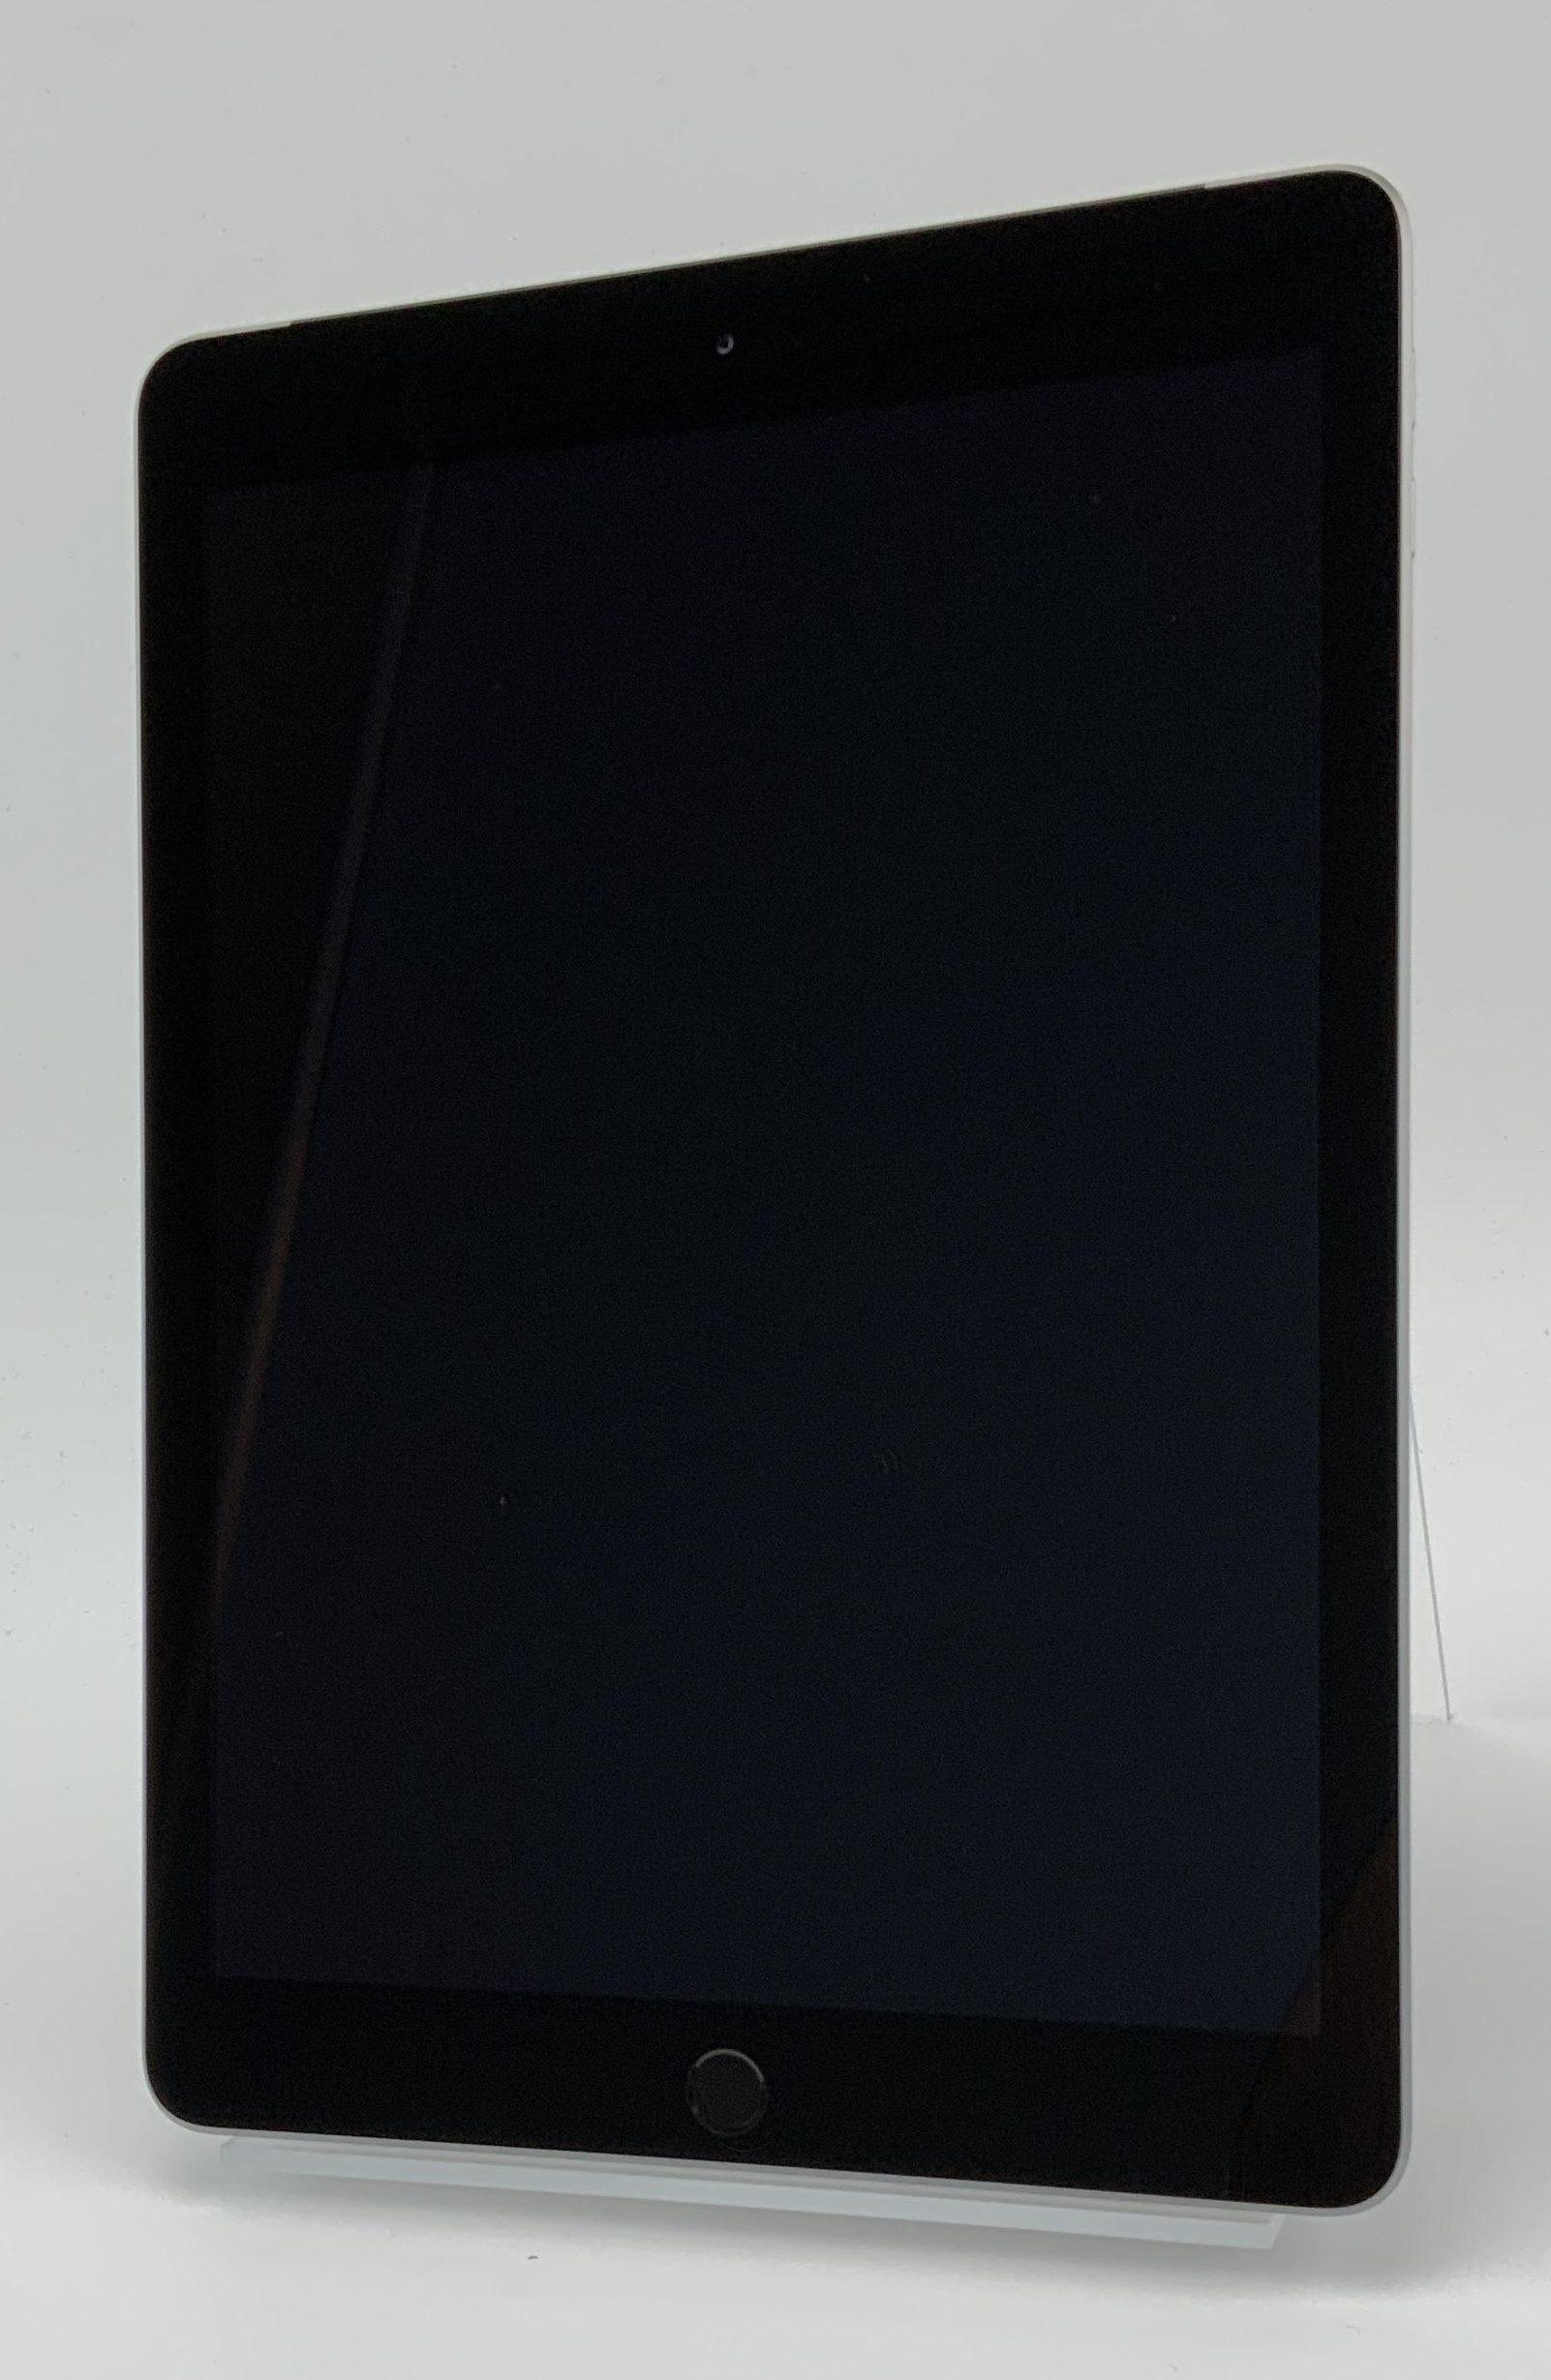 iPad 5 Wi-Fi + Cellular 32GB, 32GB, Space Gray, Kuva 1